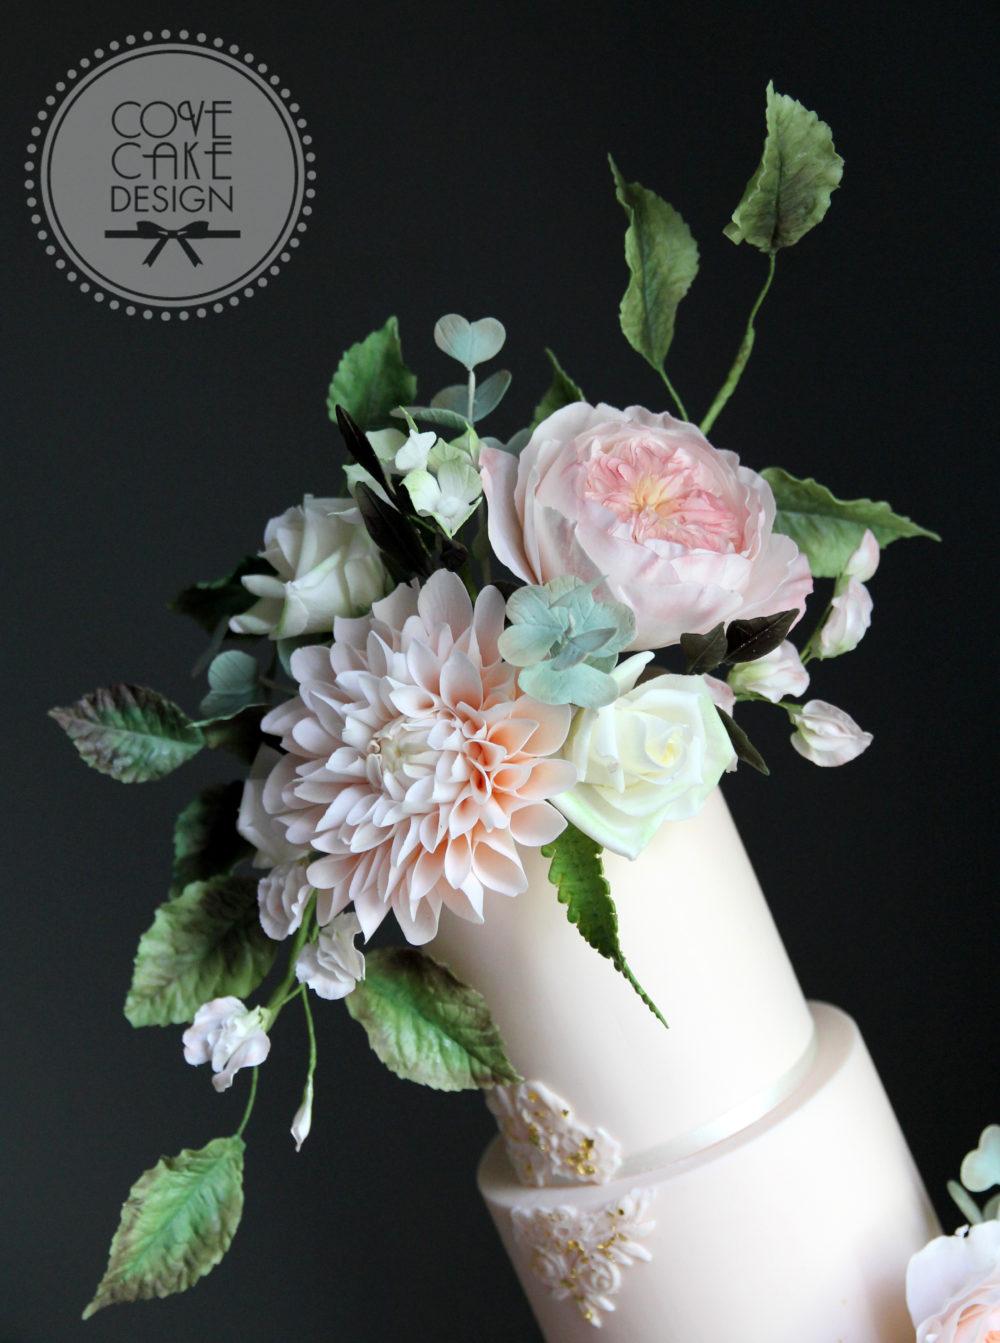 Garden Flowers Wedding Cake Cove Cake Design